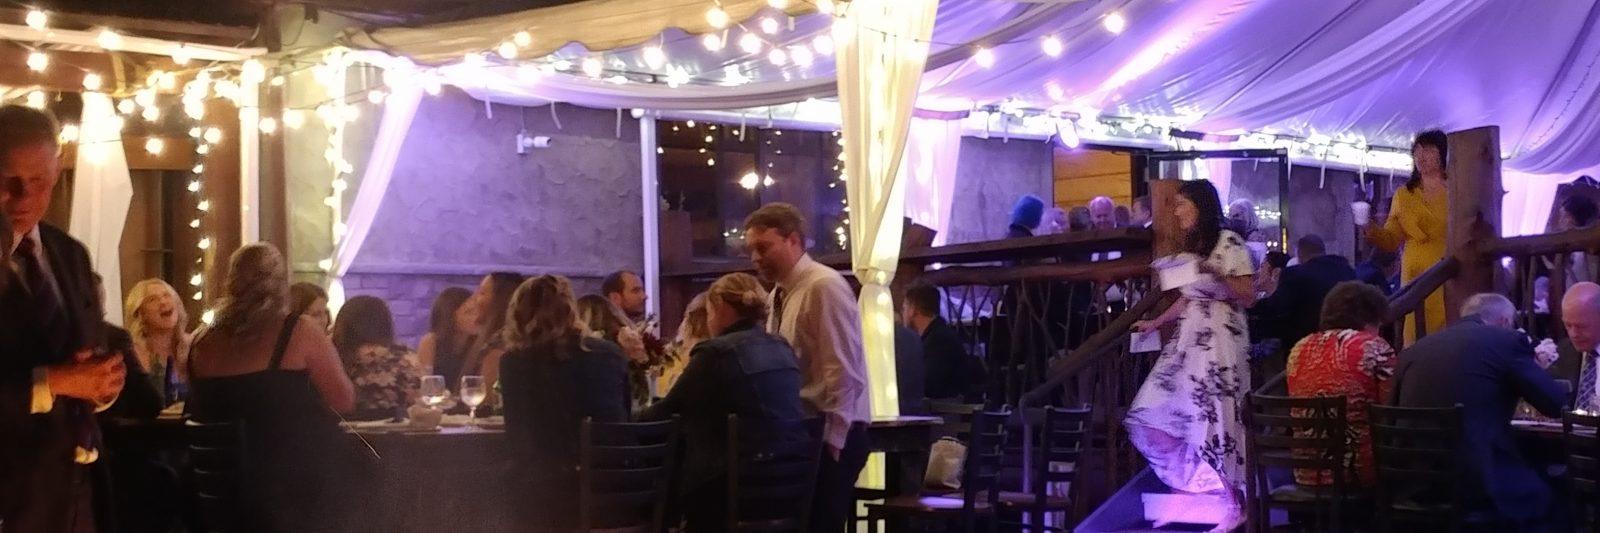 Wedding event under tent